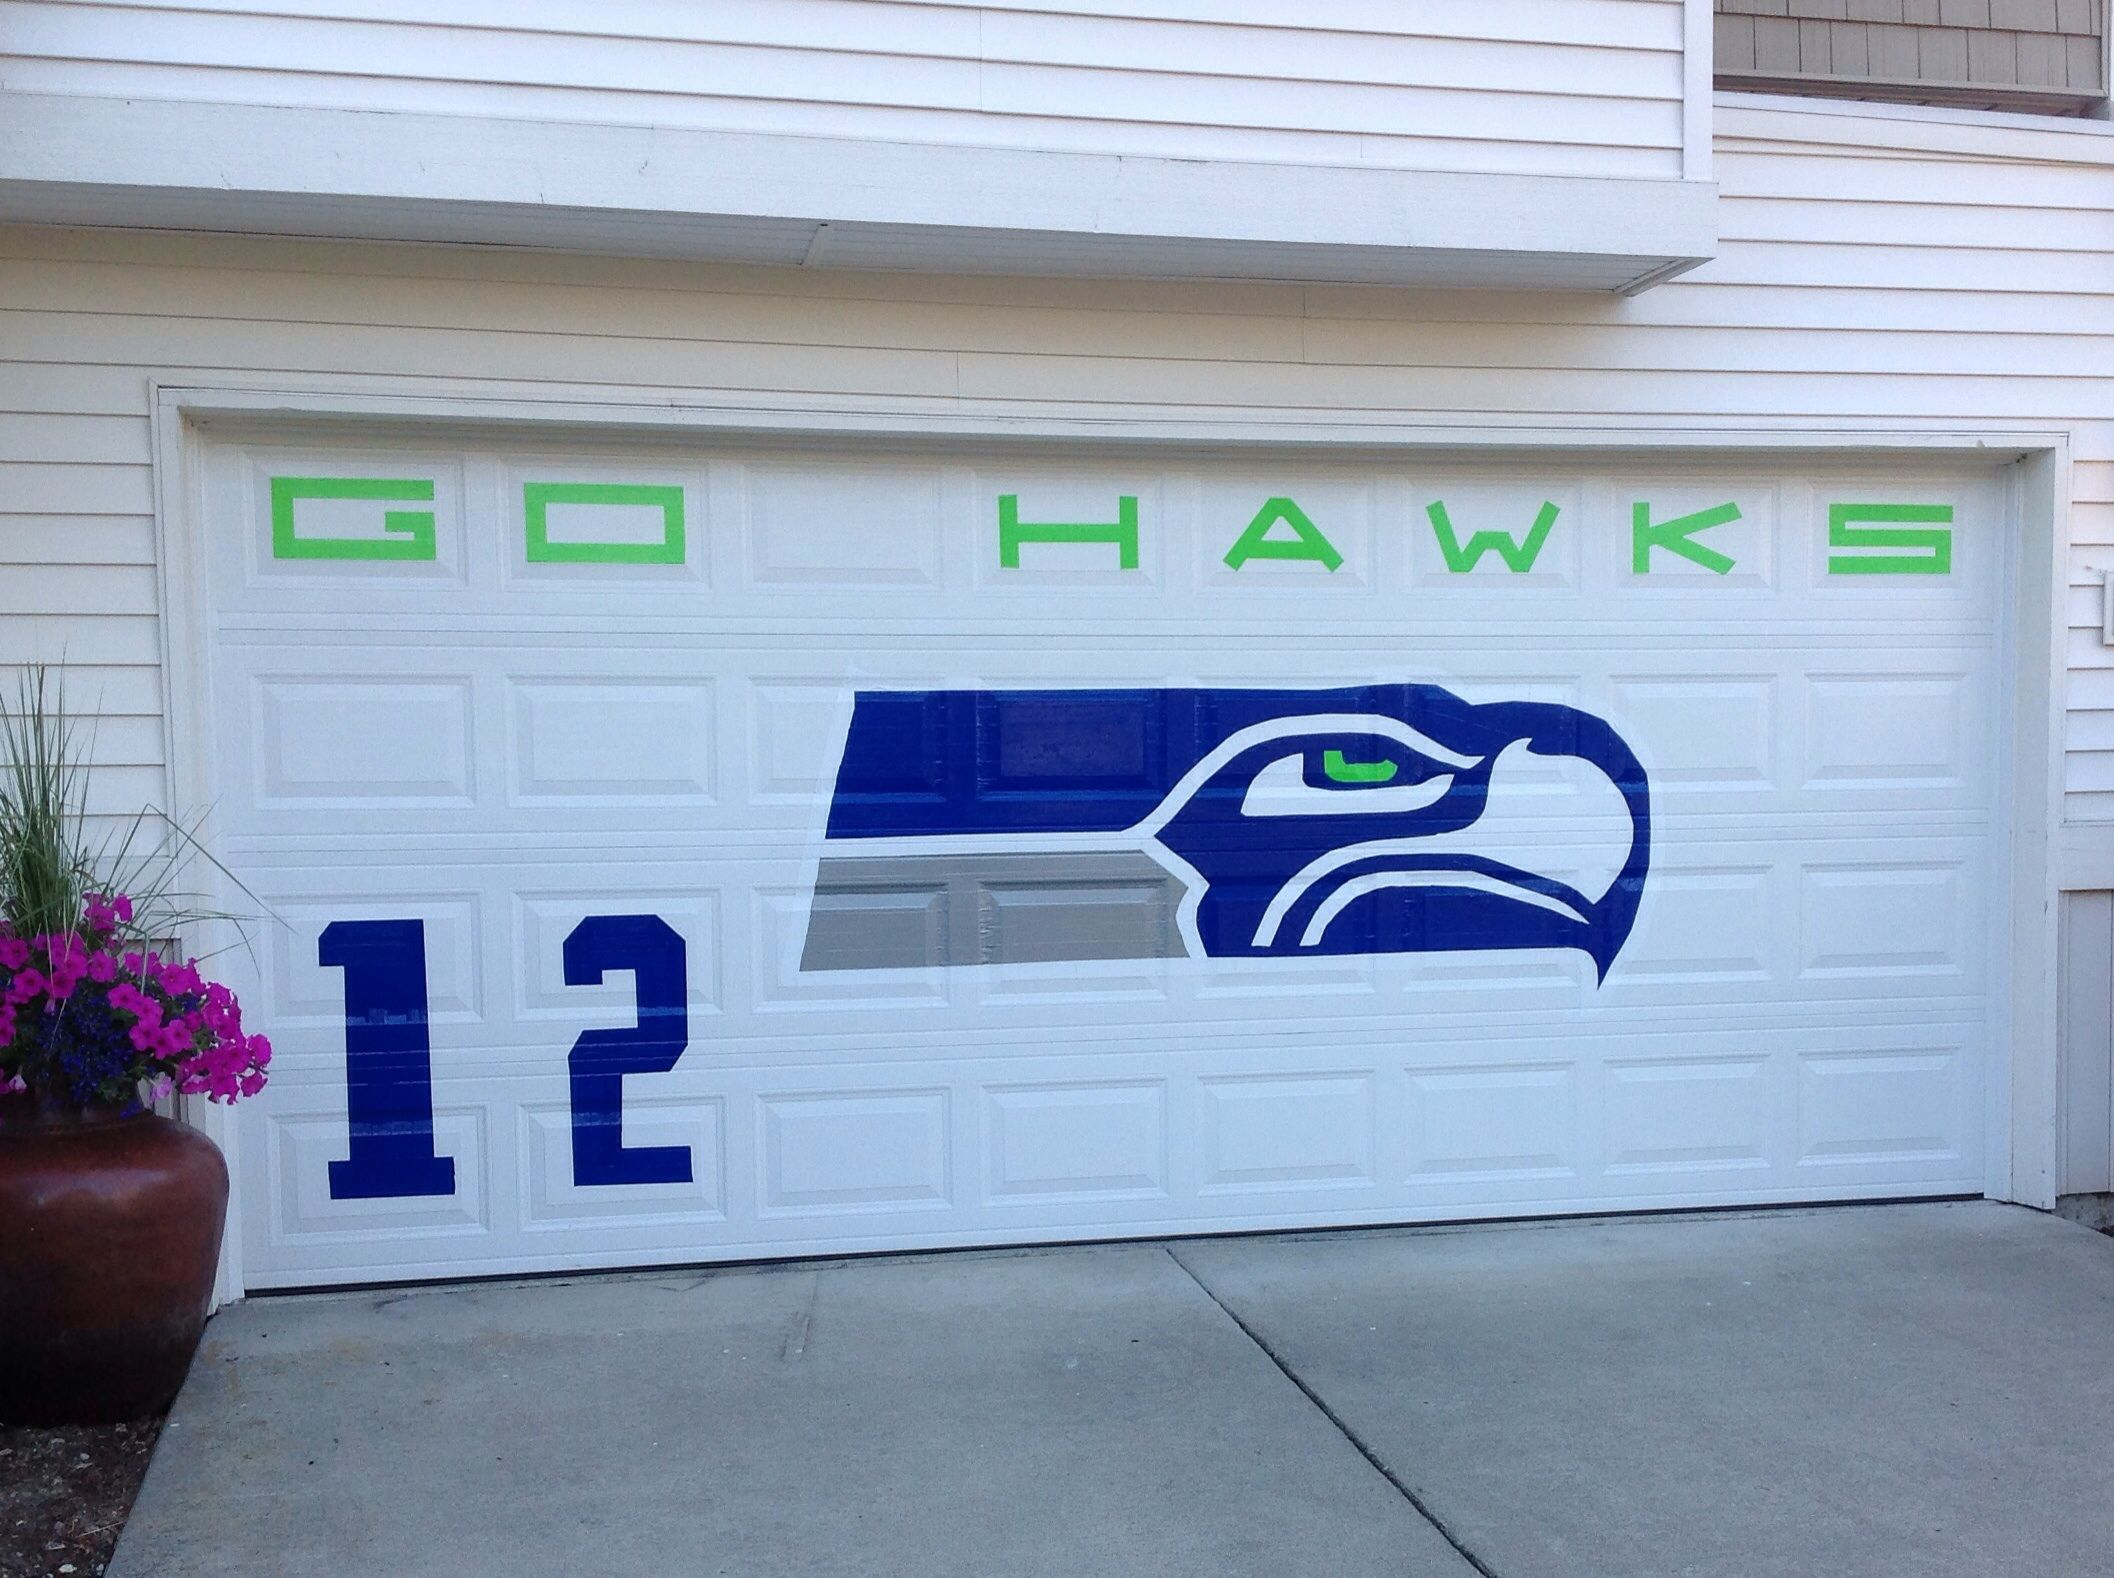 Love my Seattle Seahawks! Showing our Hawk pride at home in Auburn WA. GO HAWKS!